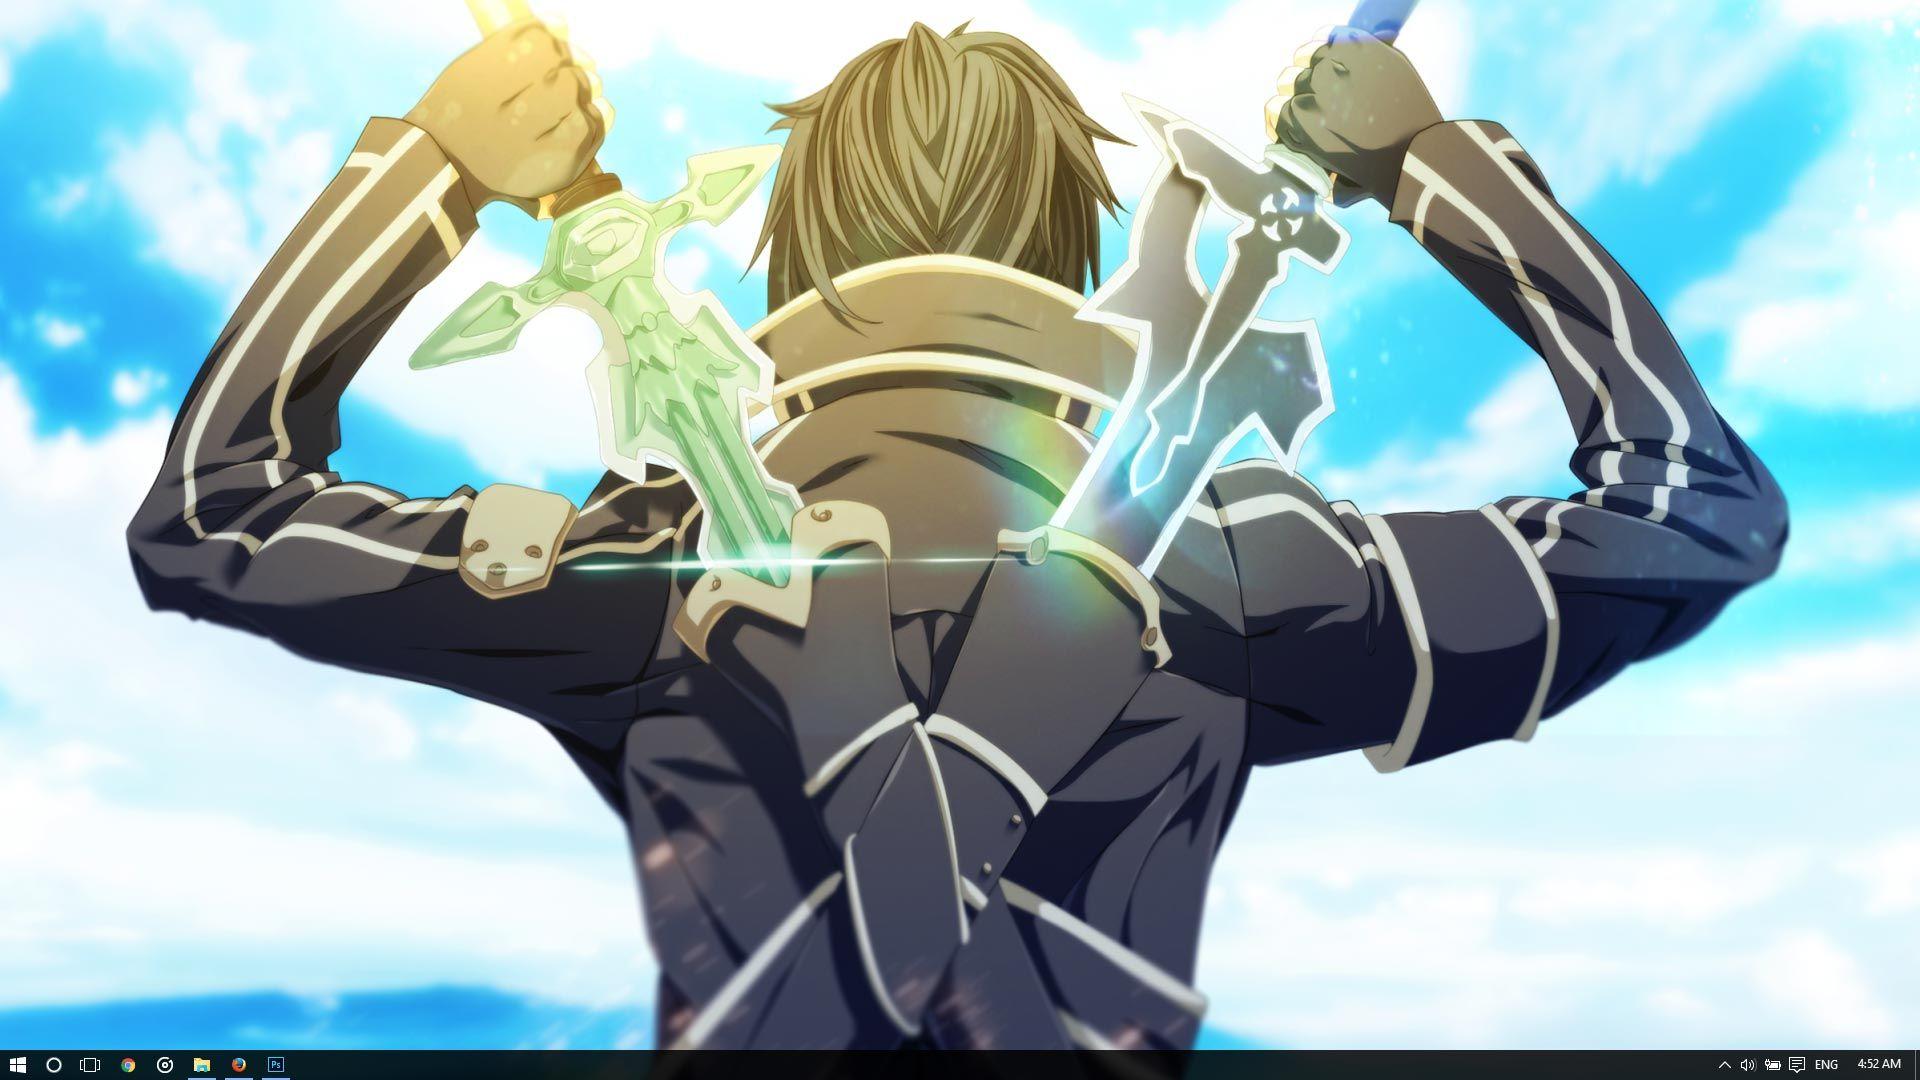 Kirito Theme for Windows 10 8 7 Sword art, Sword art